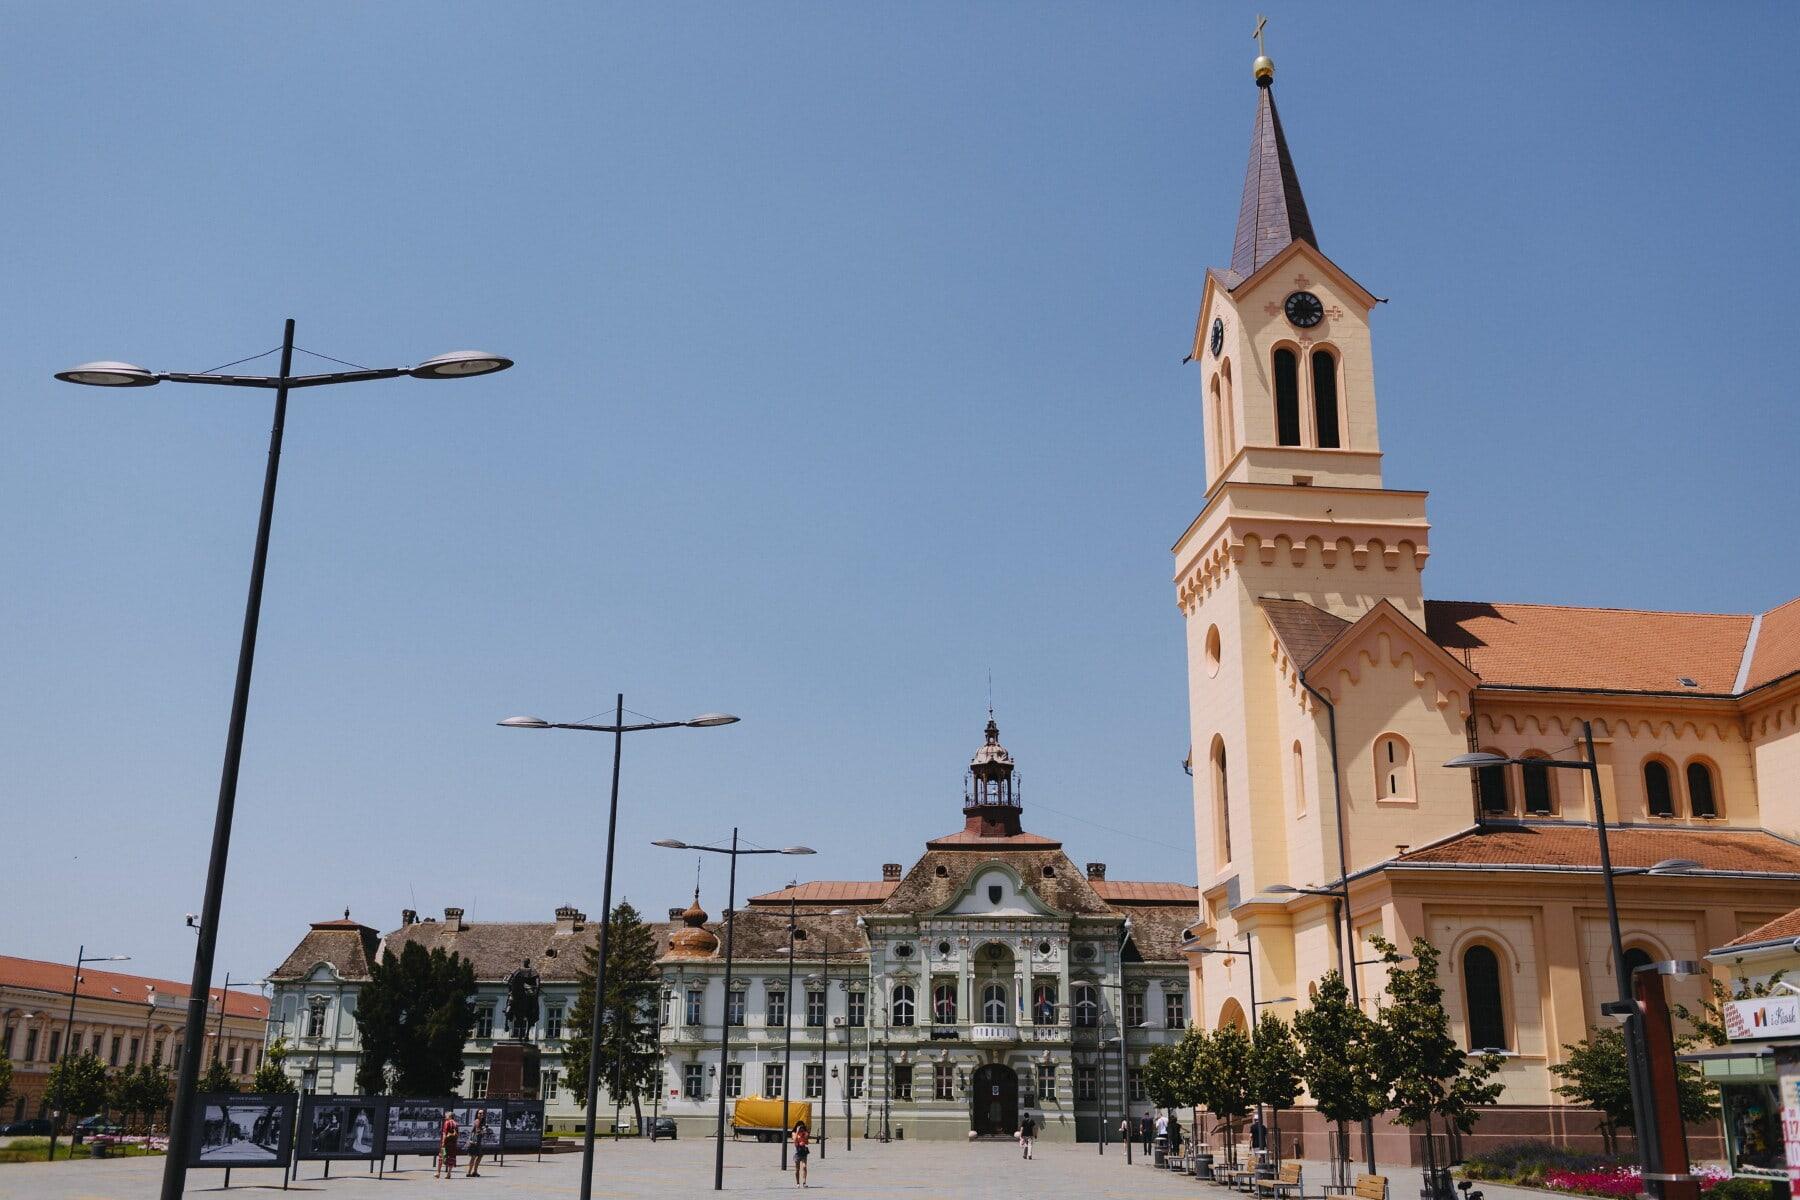 Innenstadt, Stadt, Europa, East, Platz, Rathaus, Hauptstadt, Kirchturm, Architektur, kathedrale